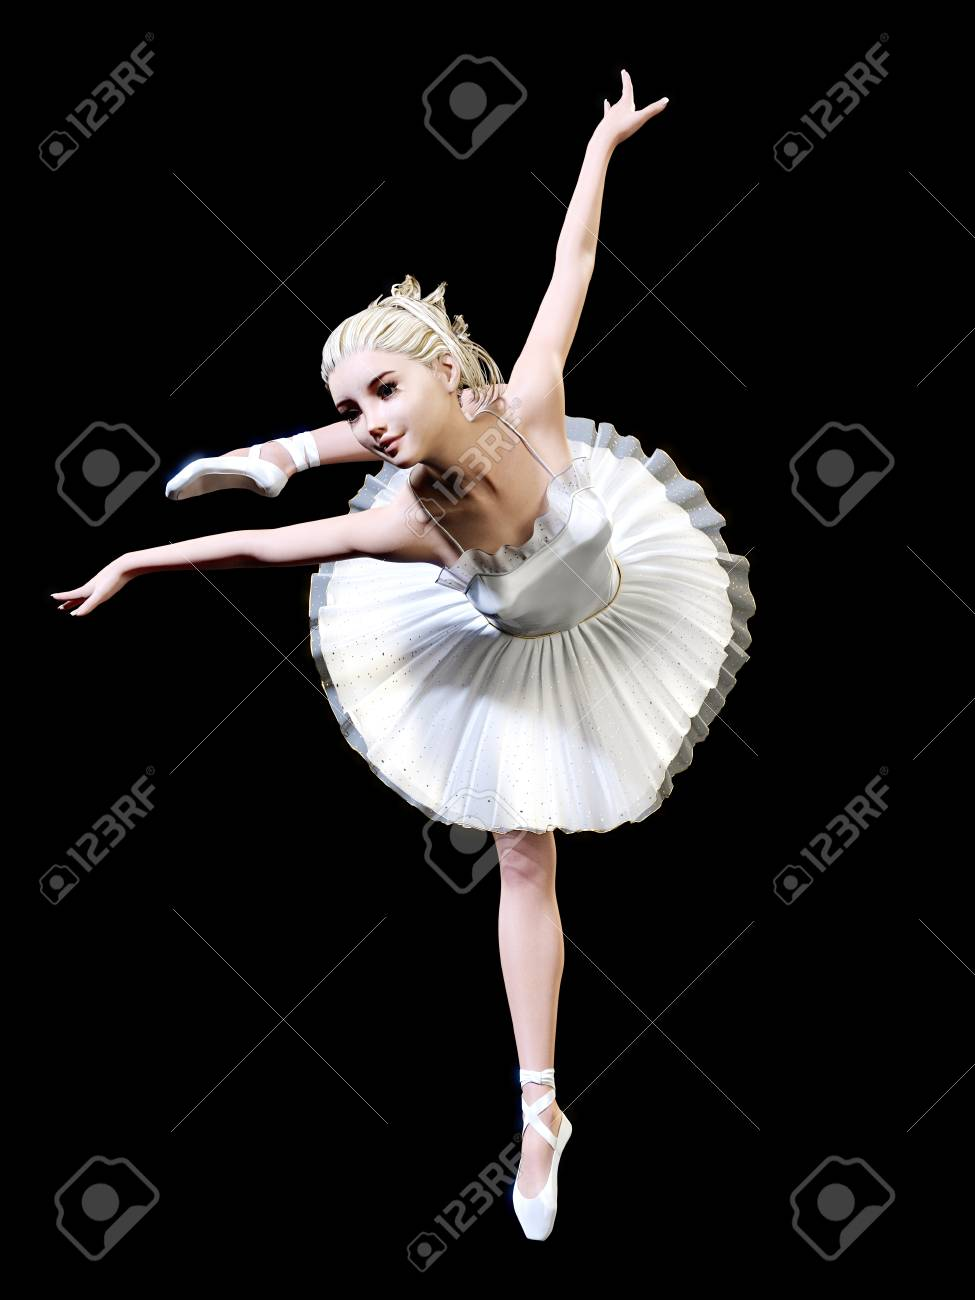 9f40cf2fcd711 Dancing ballerina 3D. White ballet tutu. Blonde girl with blue eyes. Ballet  dancer